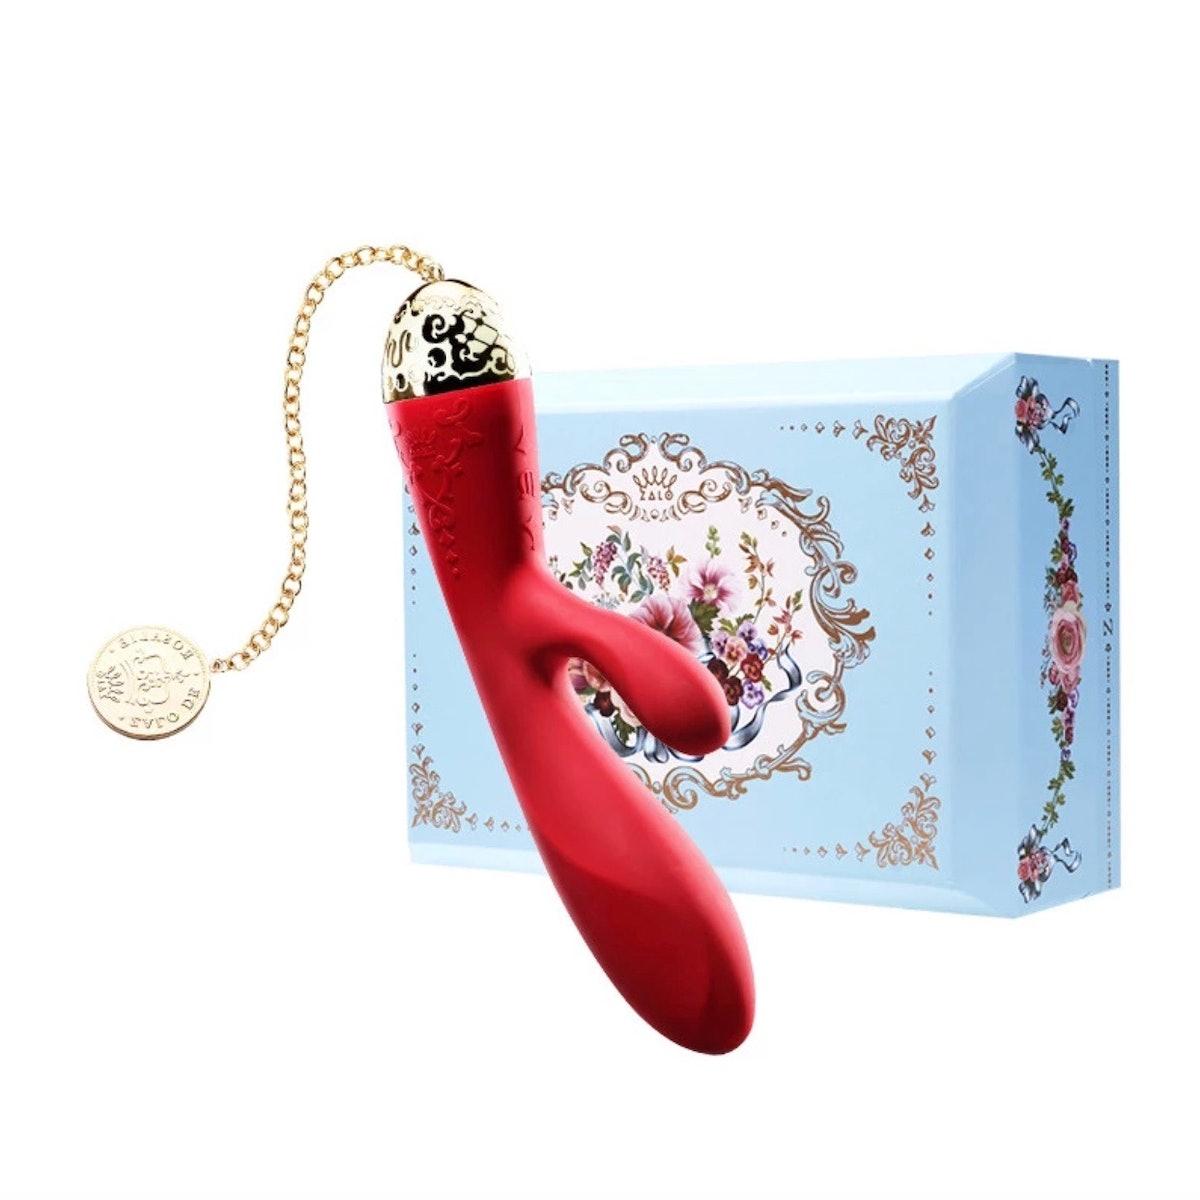 Rosalie Rabbit Vibrator - Bright Red